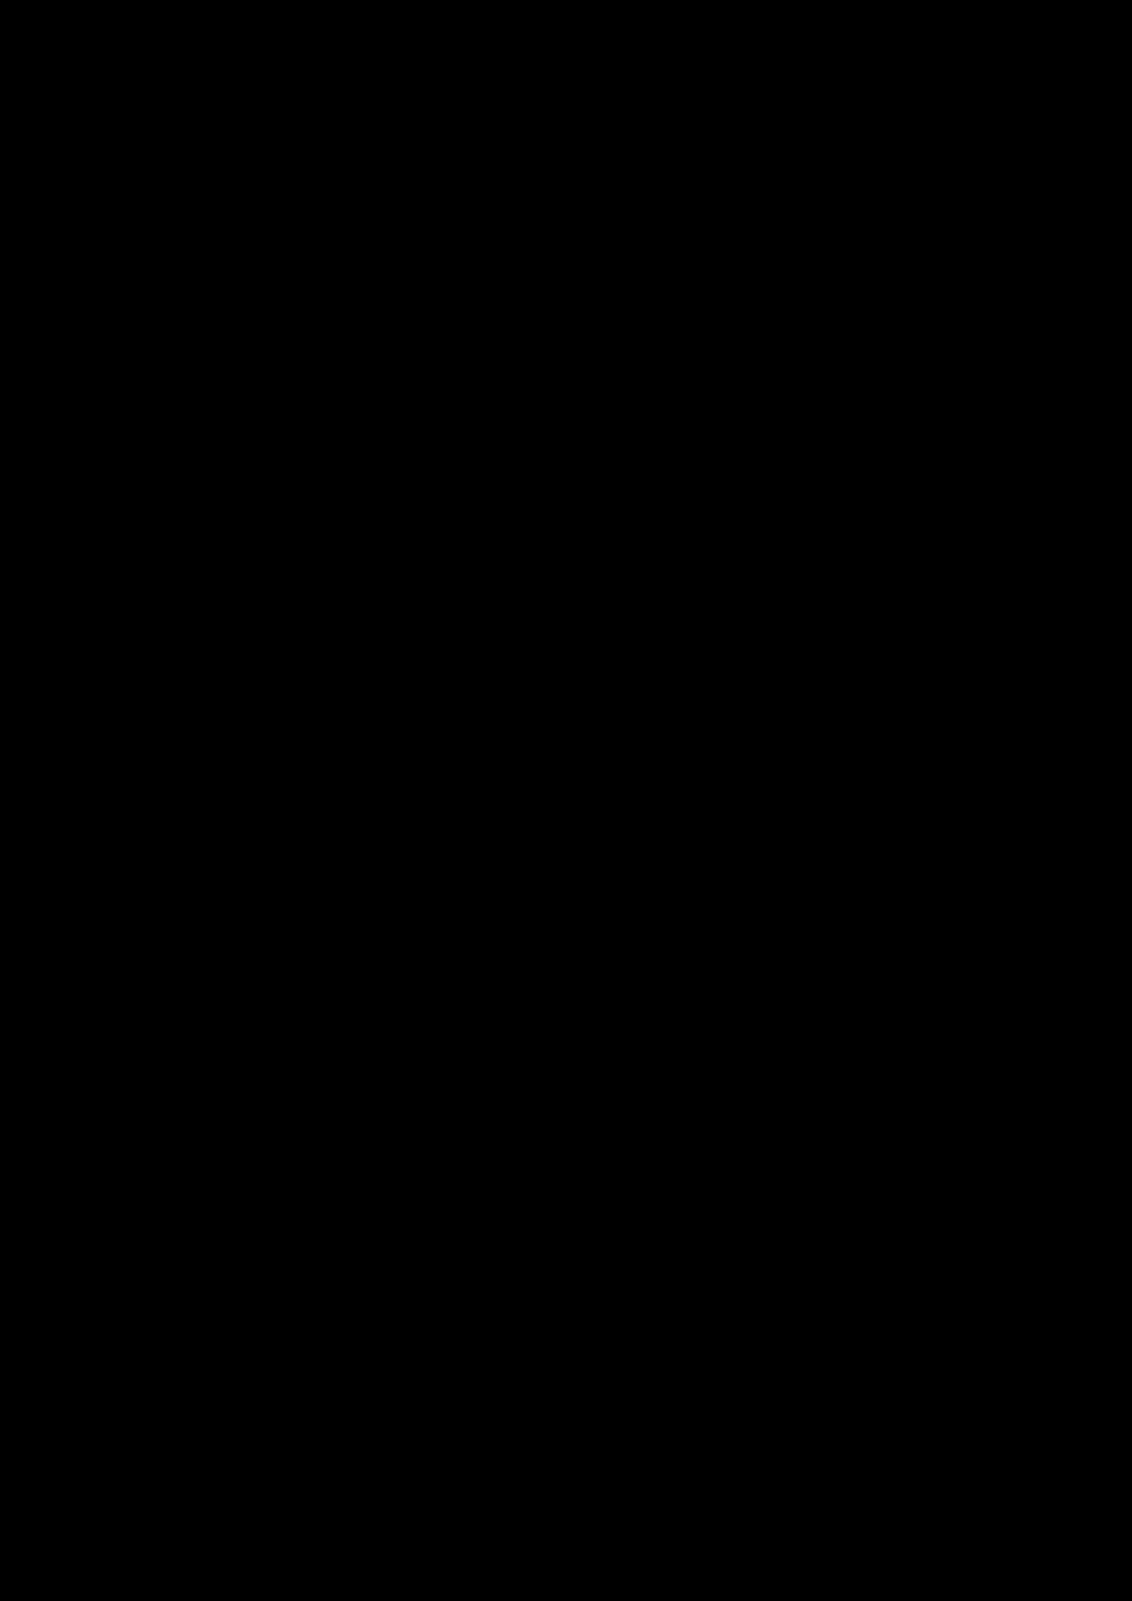 Belyiy sokol slide, Image 144